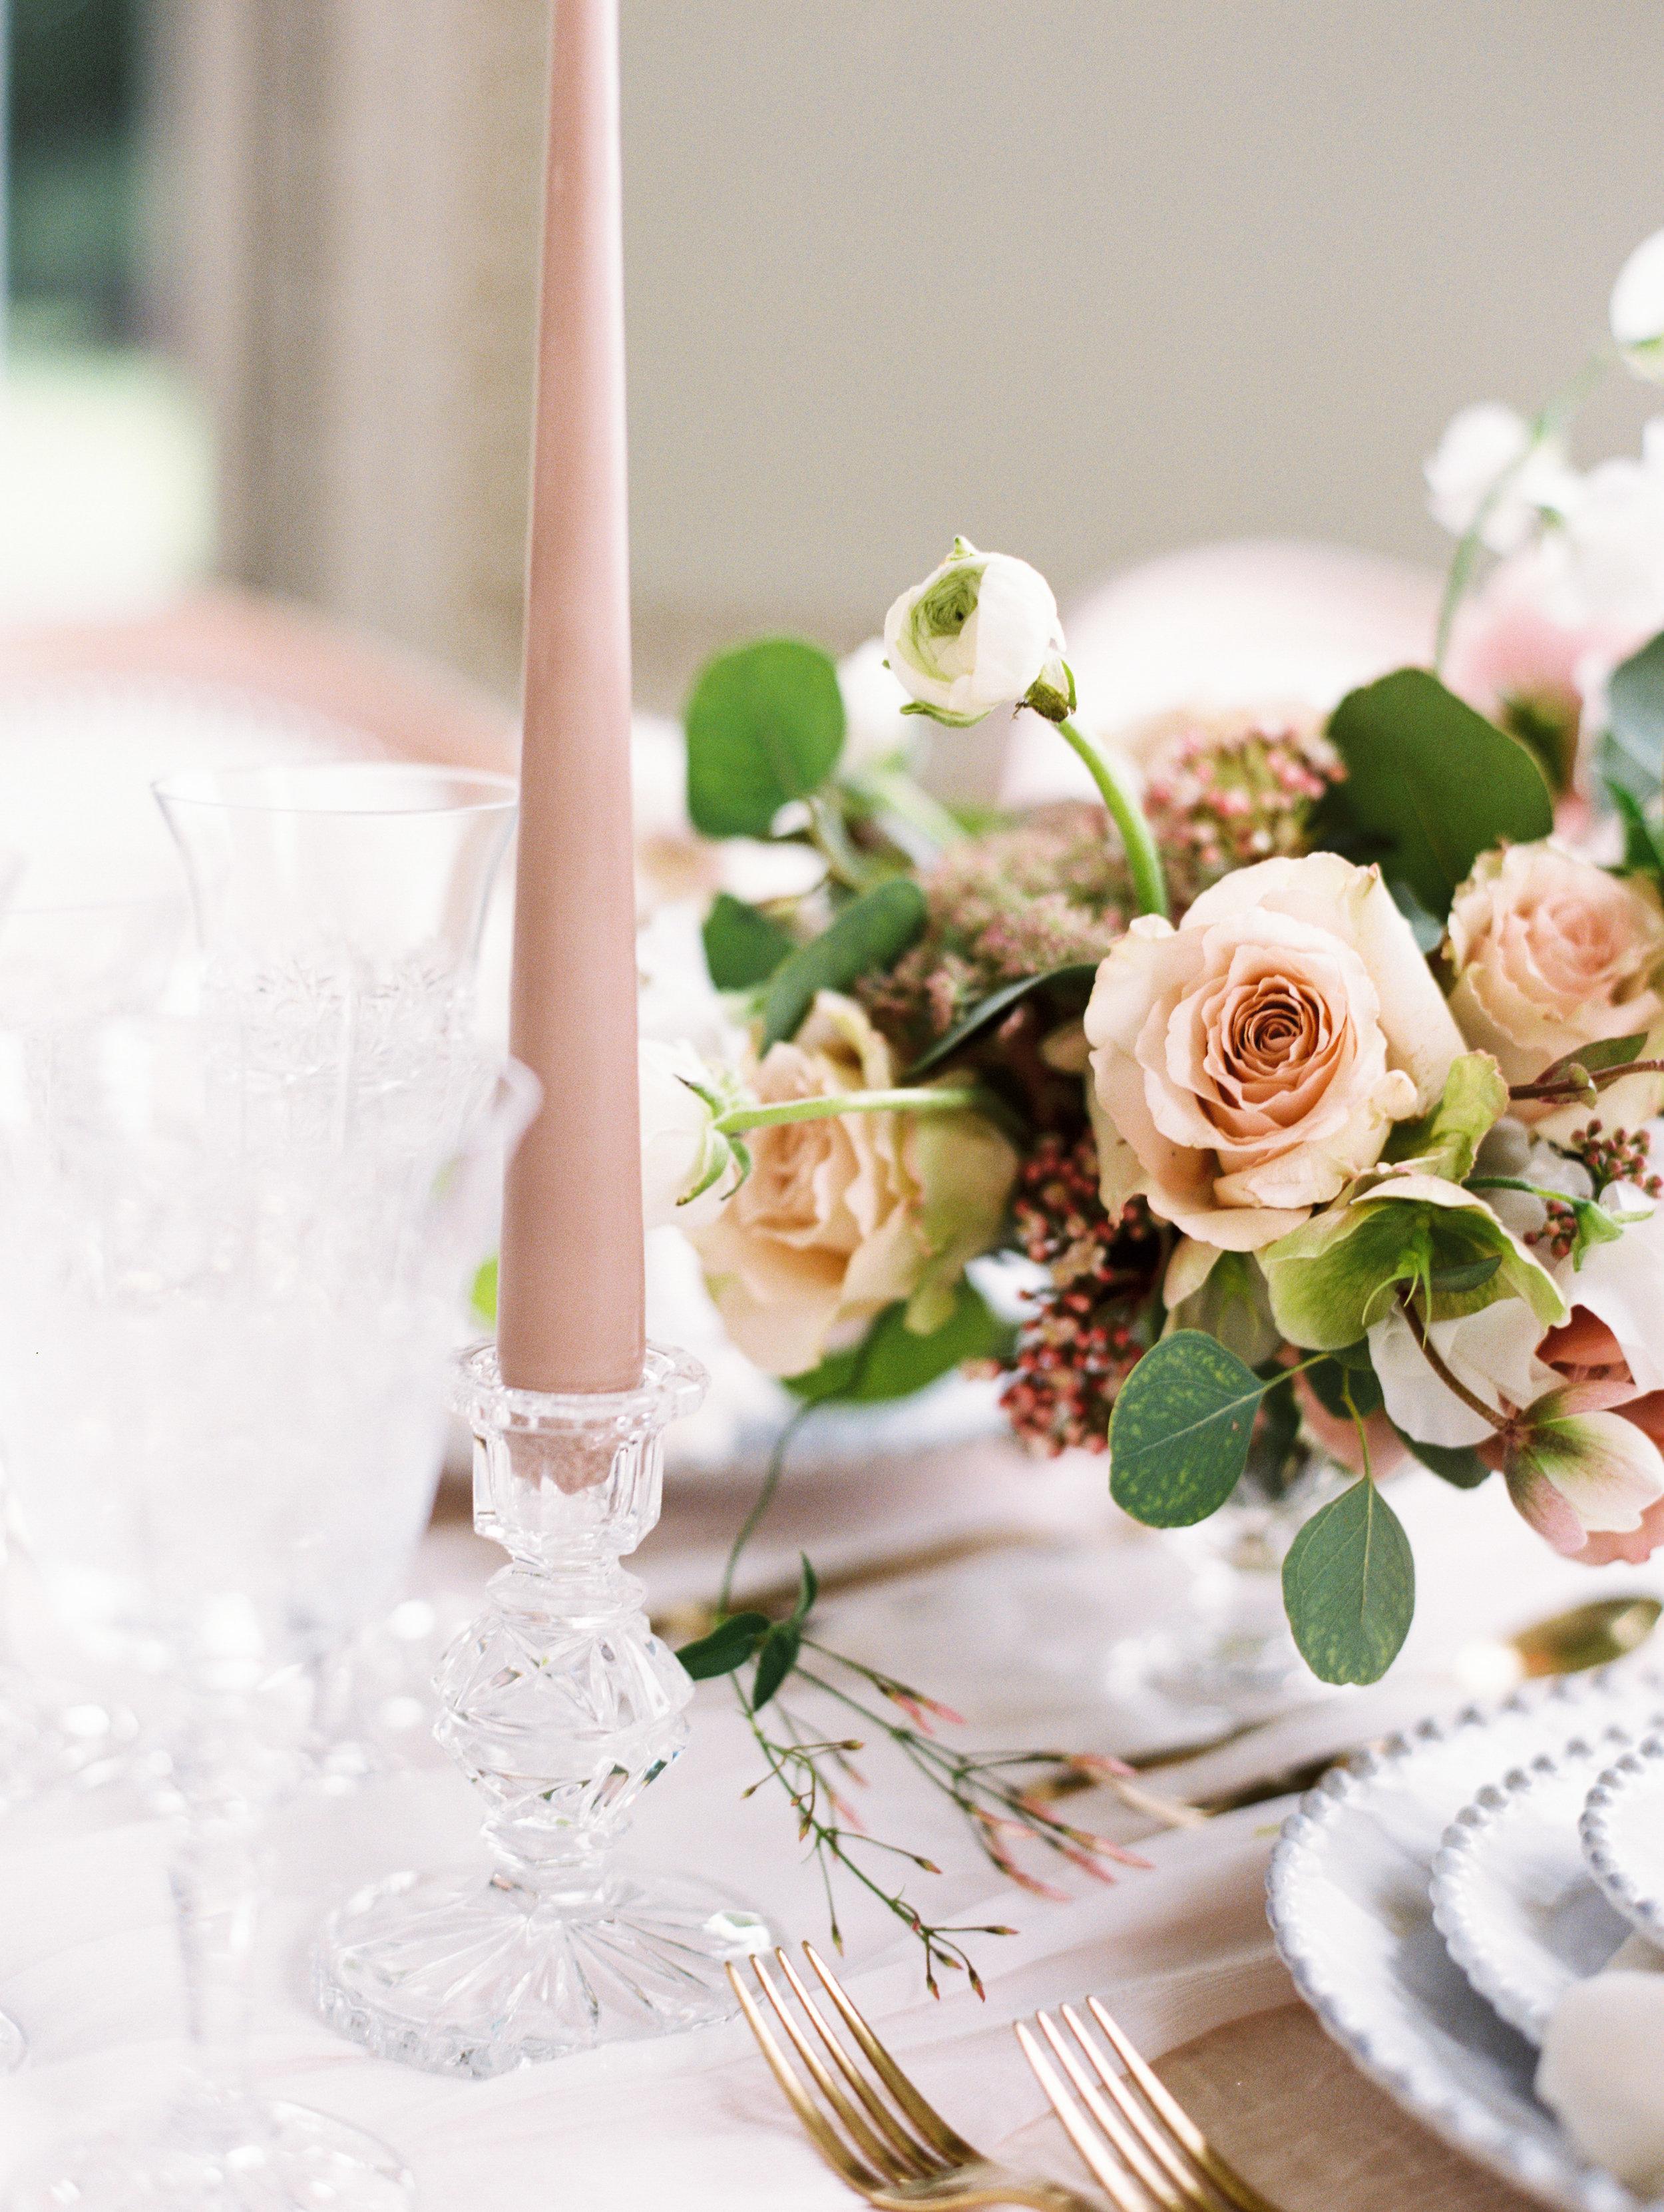 The Timeless Stylist-Elegant and Romantic Wedding Styling-Cut Glass Candlesticks.jpg